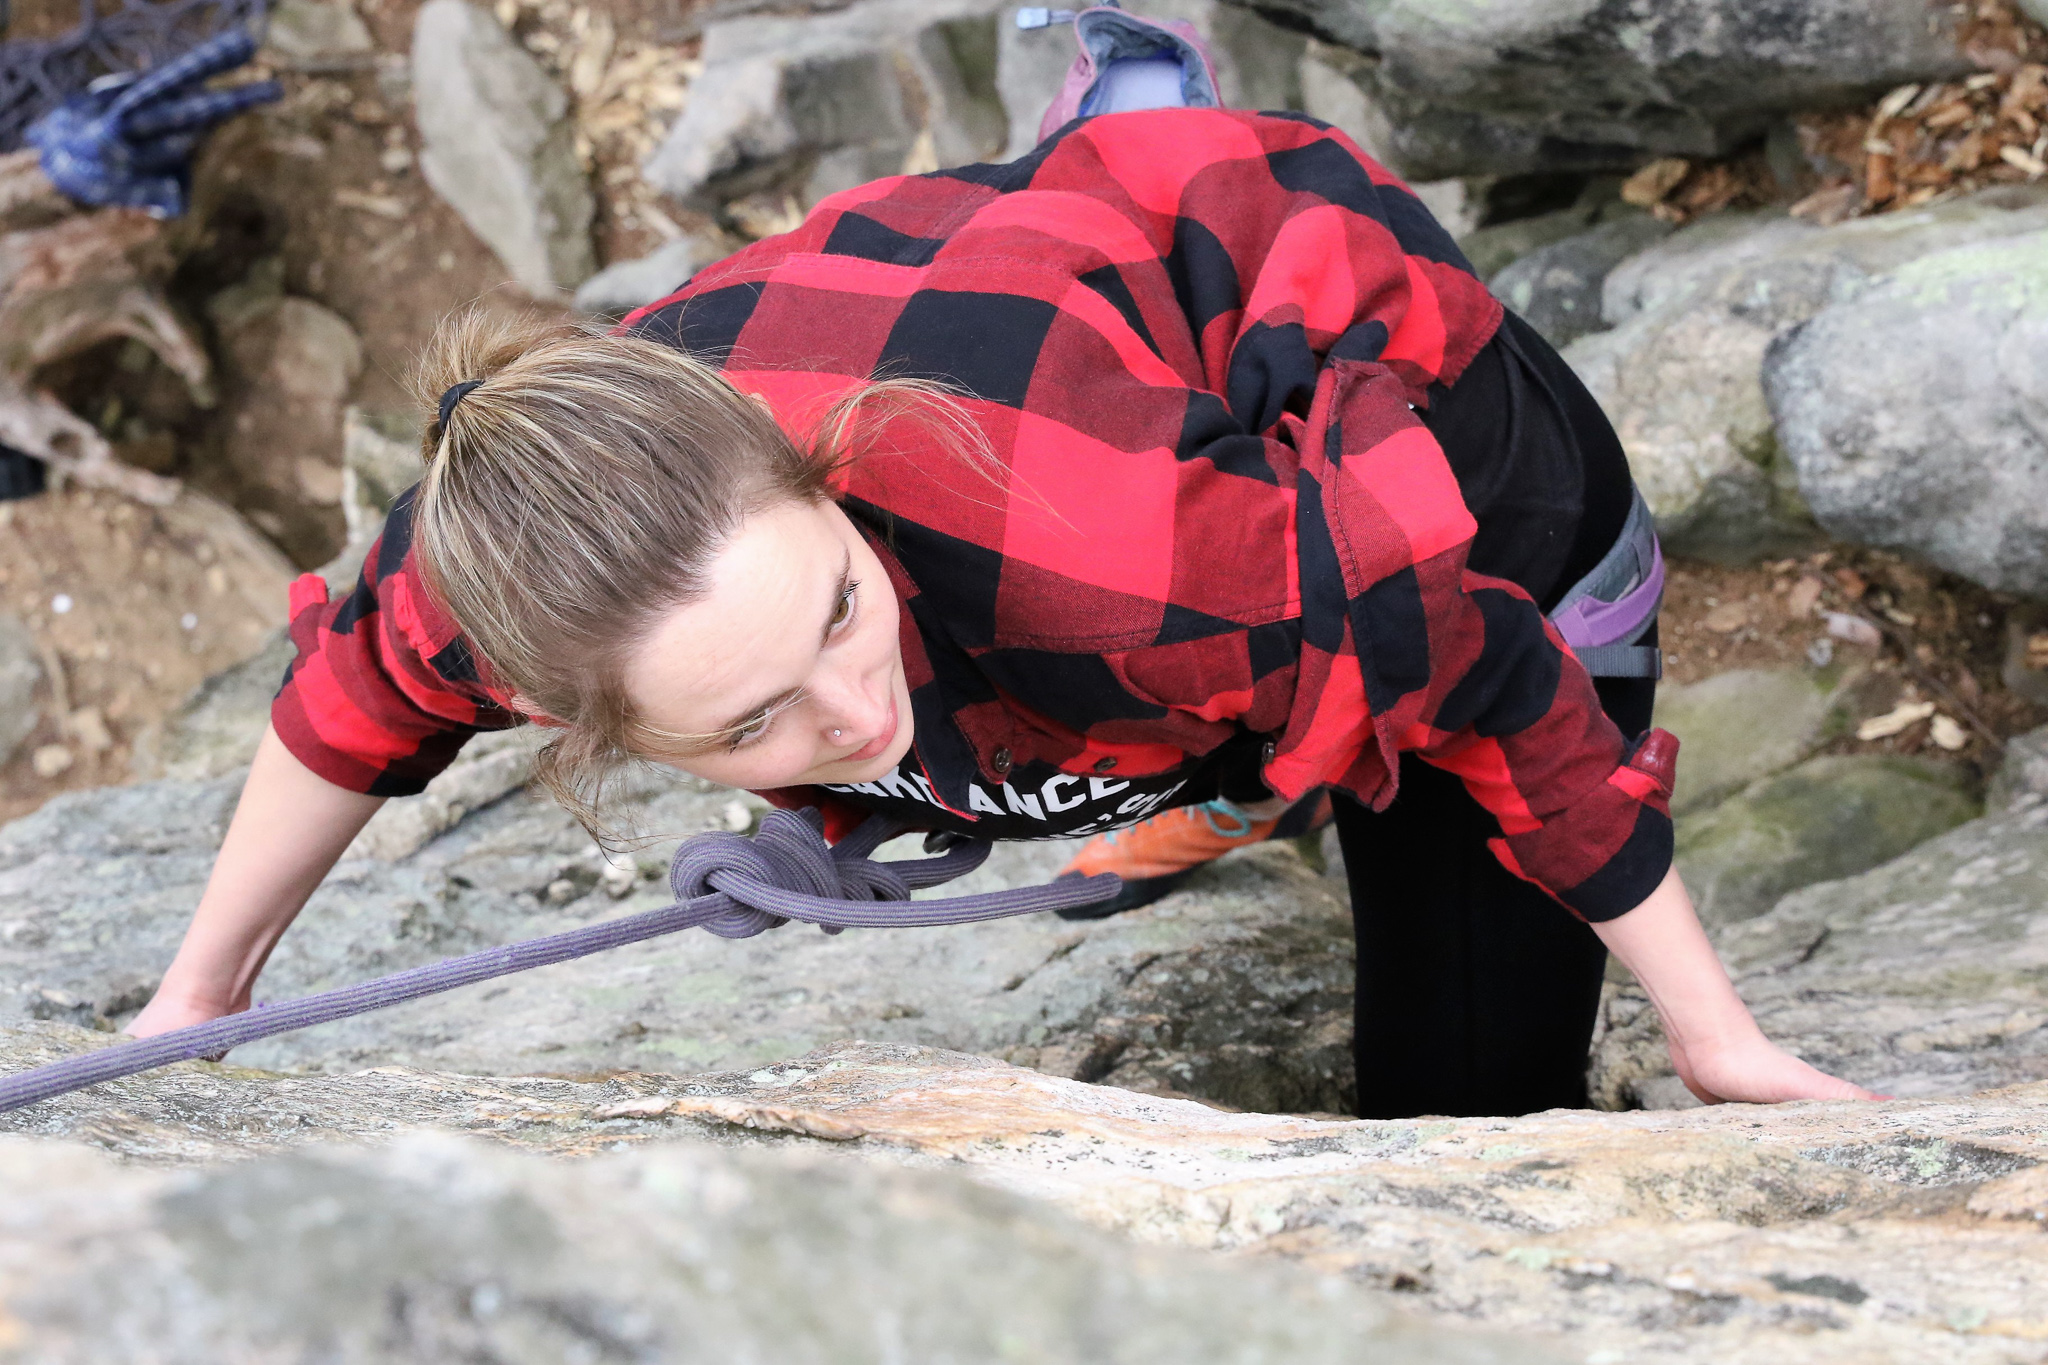 Pams Bday Climb 4-1-18 (226).jpg